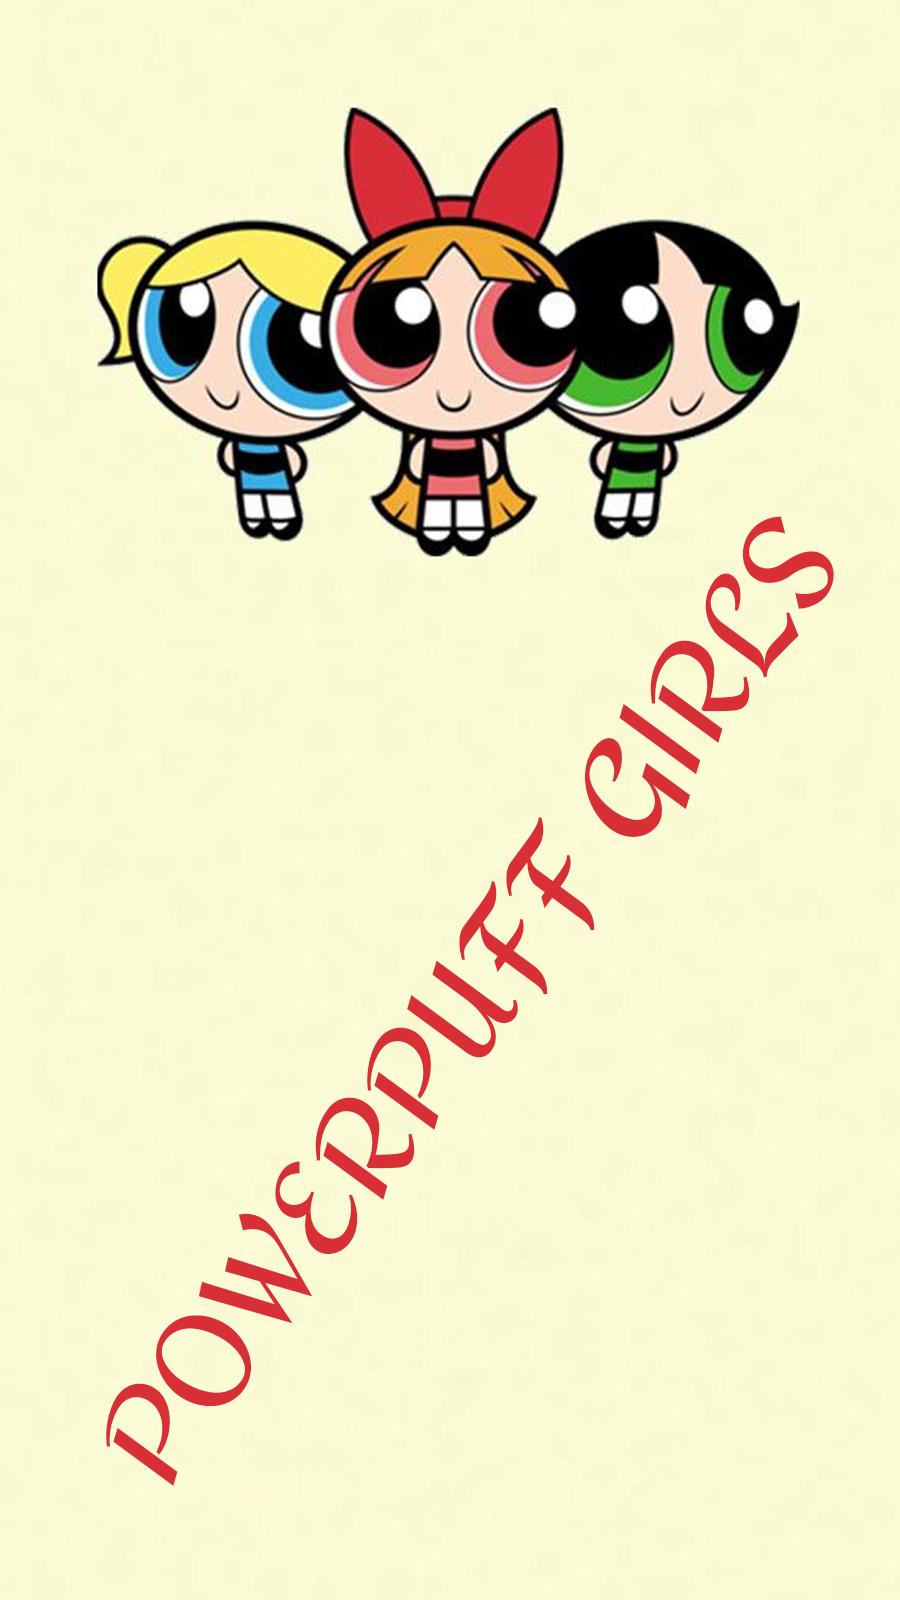 Powerpuff Girls Wallpapers Free- Cartoon Wallpapers Download